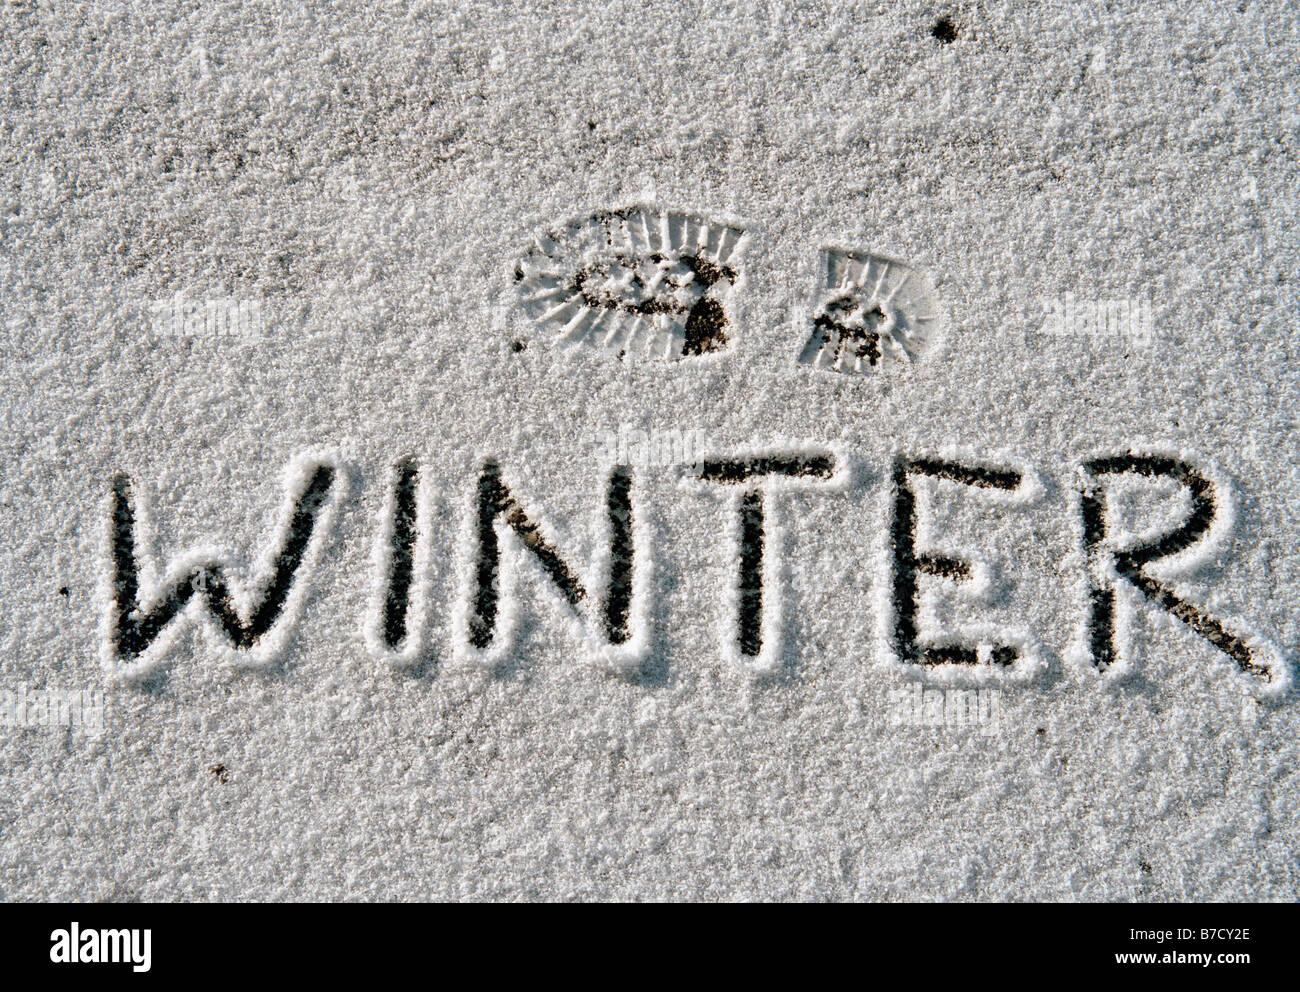 'Winter' written in snow - Stock Image